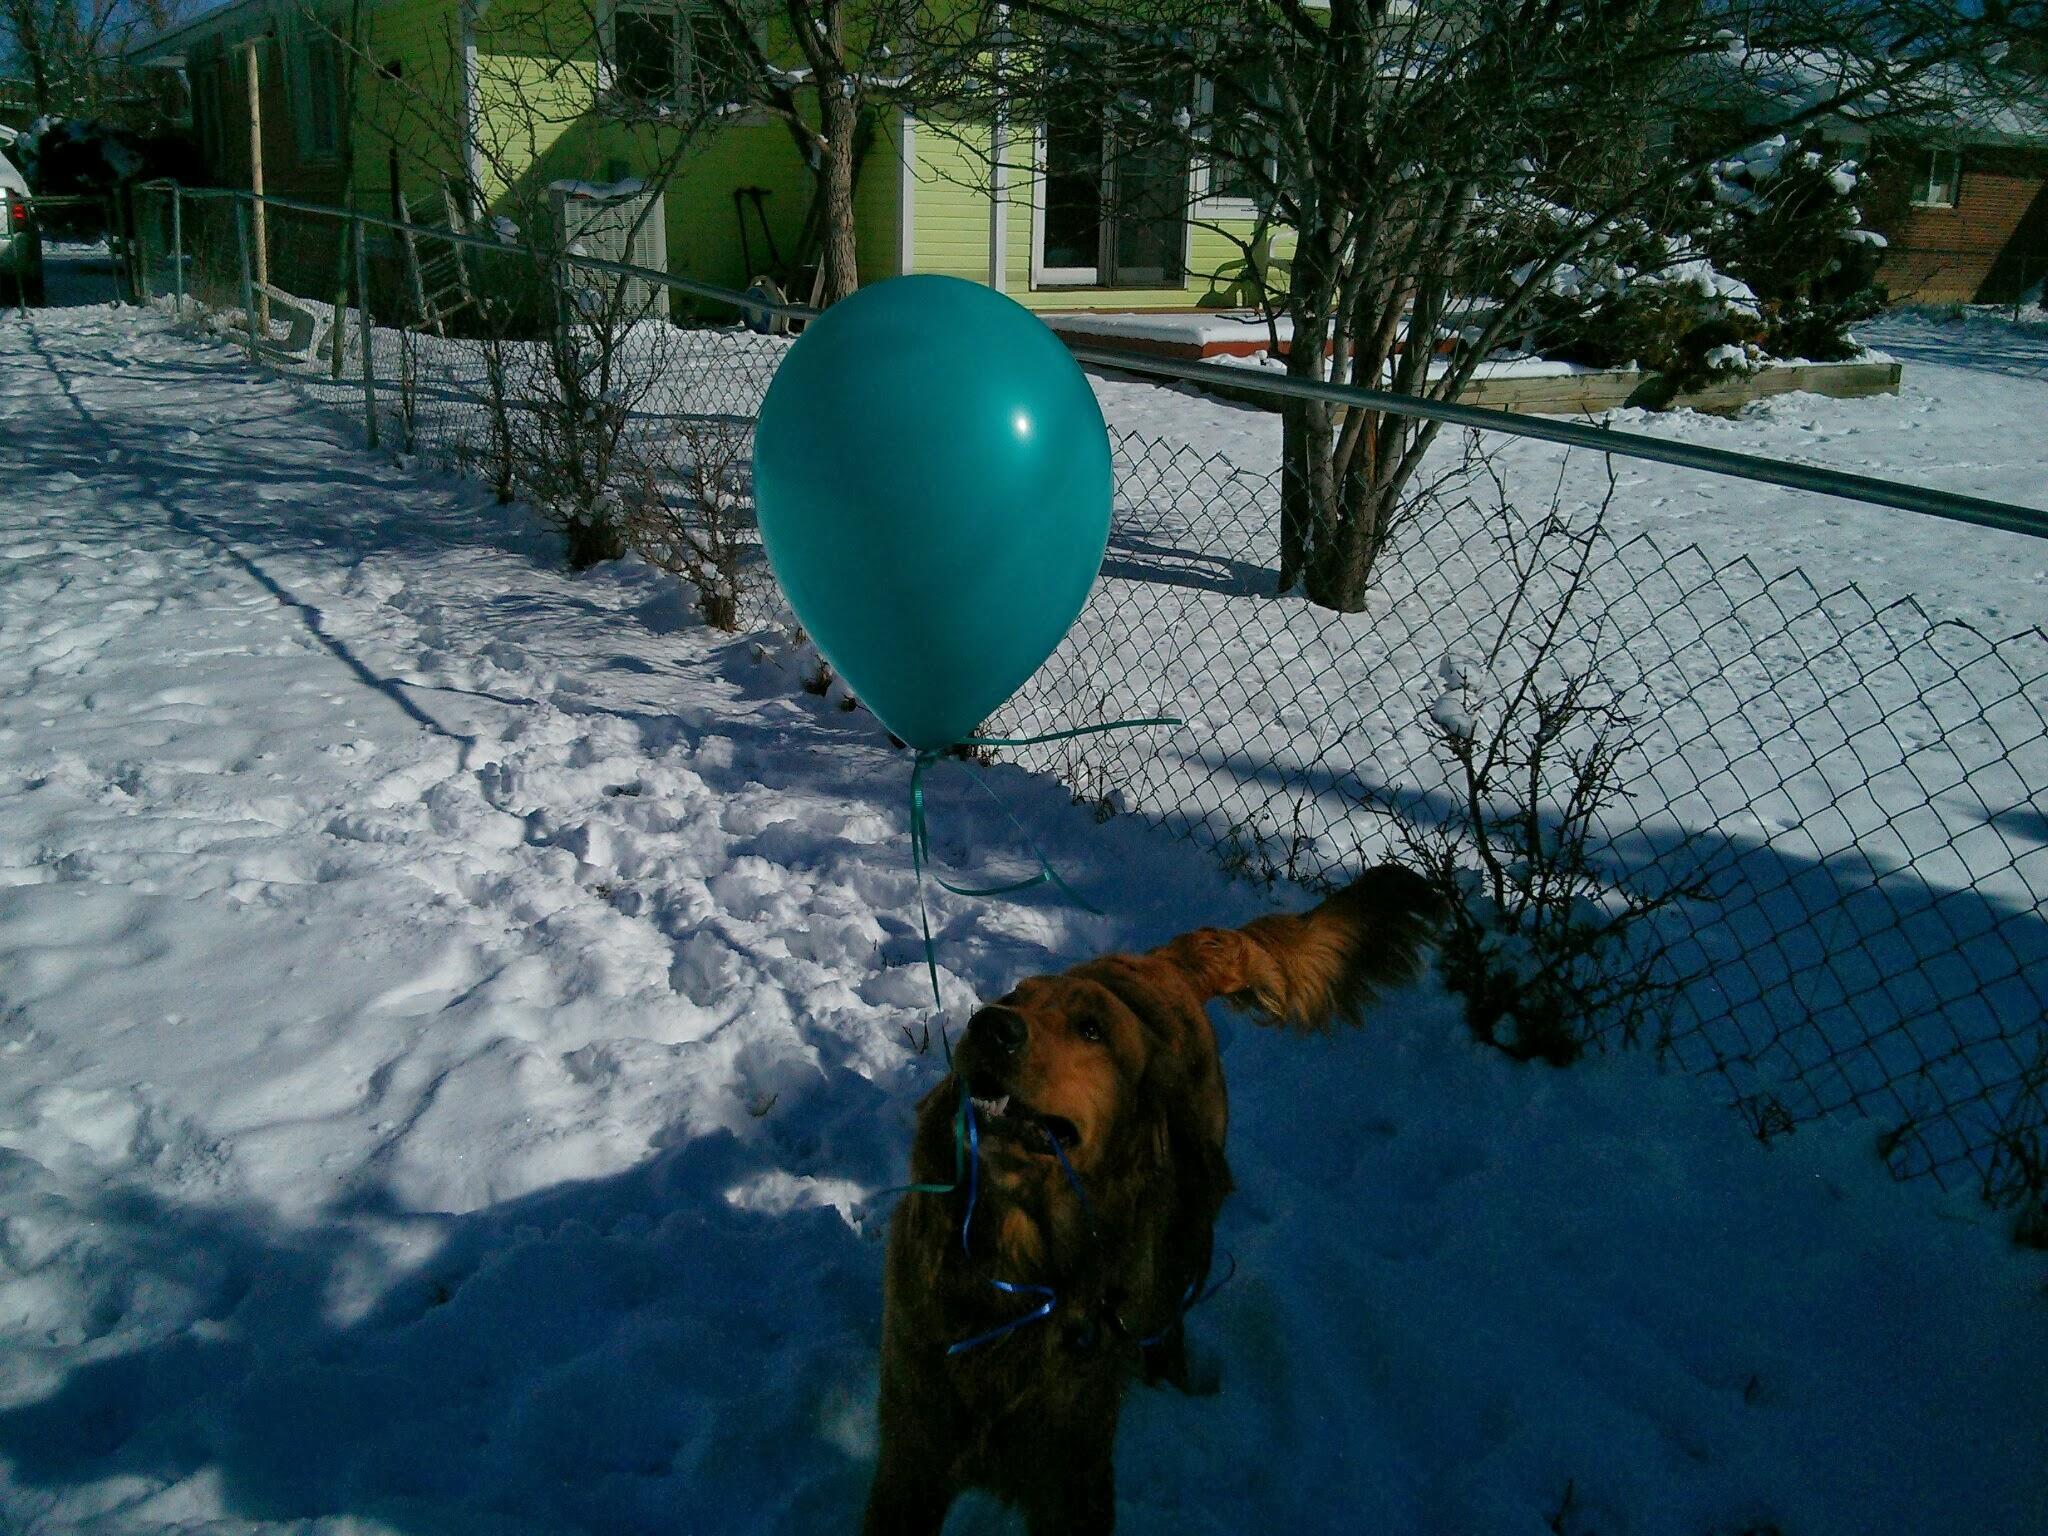 Bender the golden retriever gives the balloon a dirty look